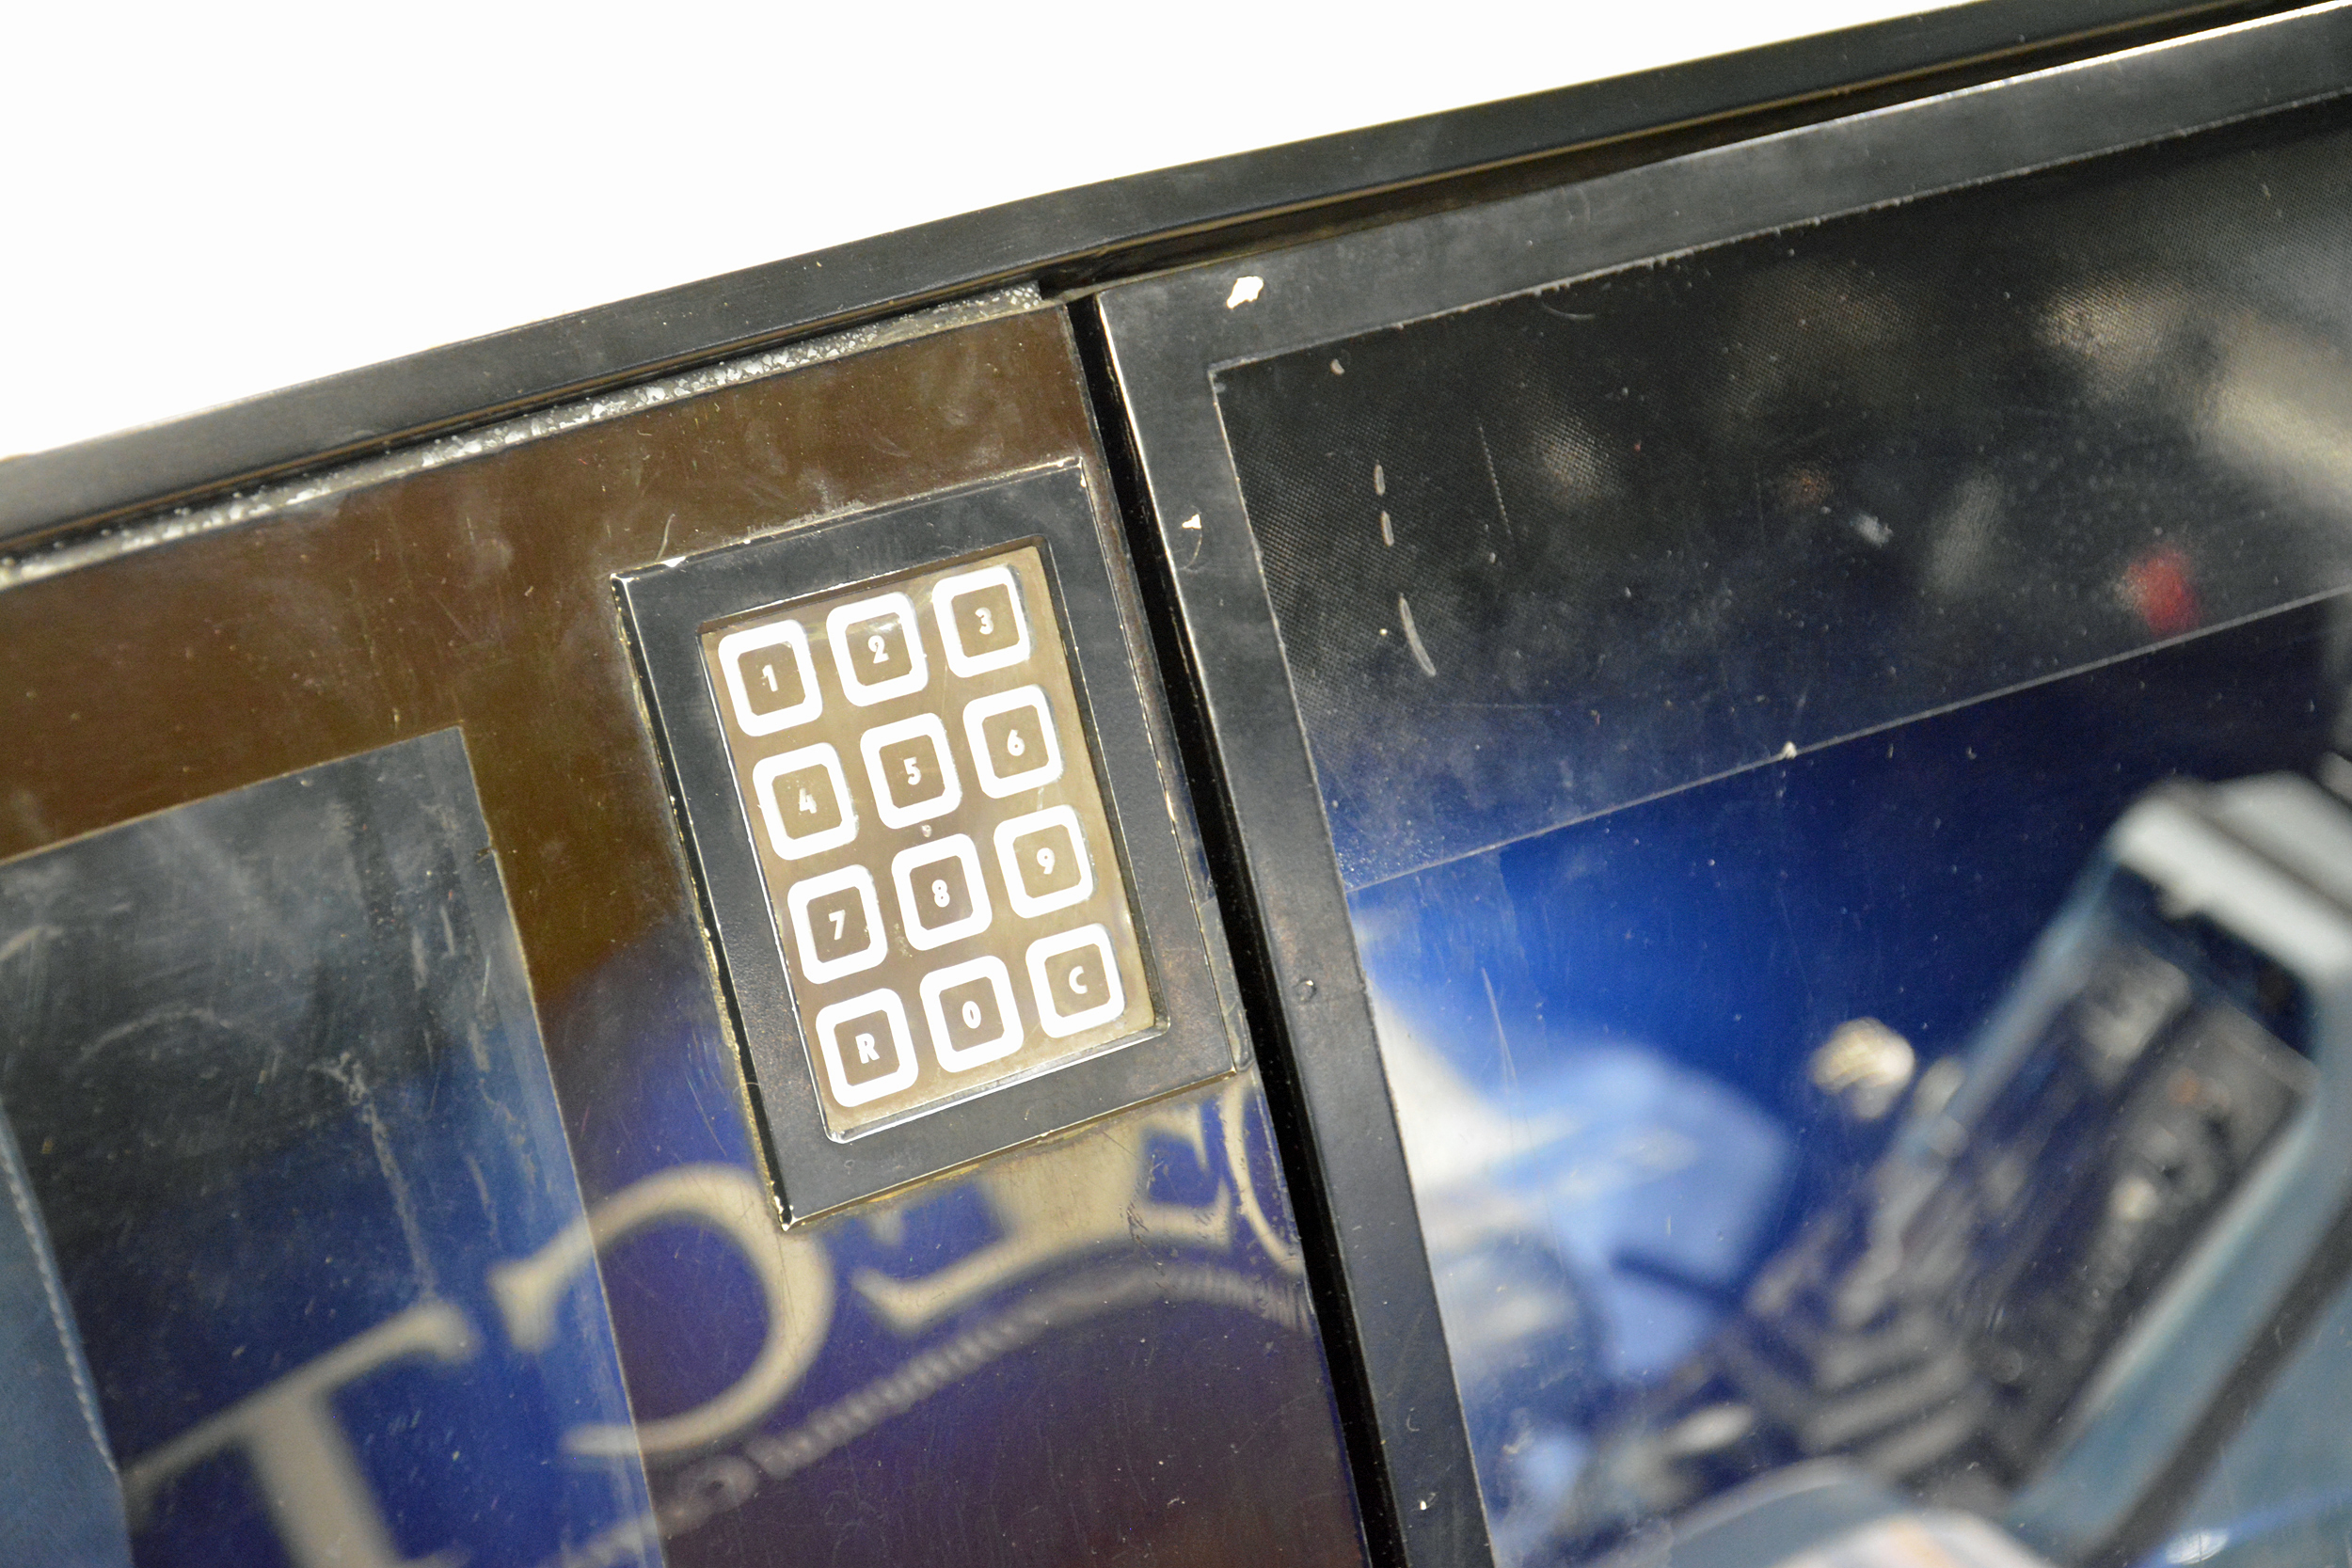 saab museum volvo lcp keypad detail